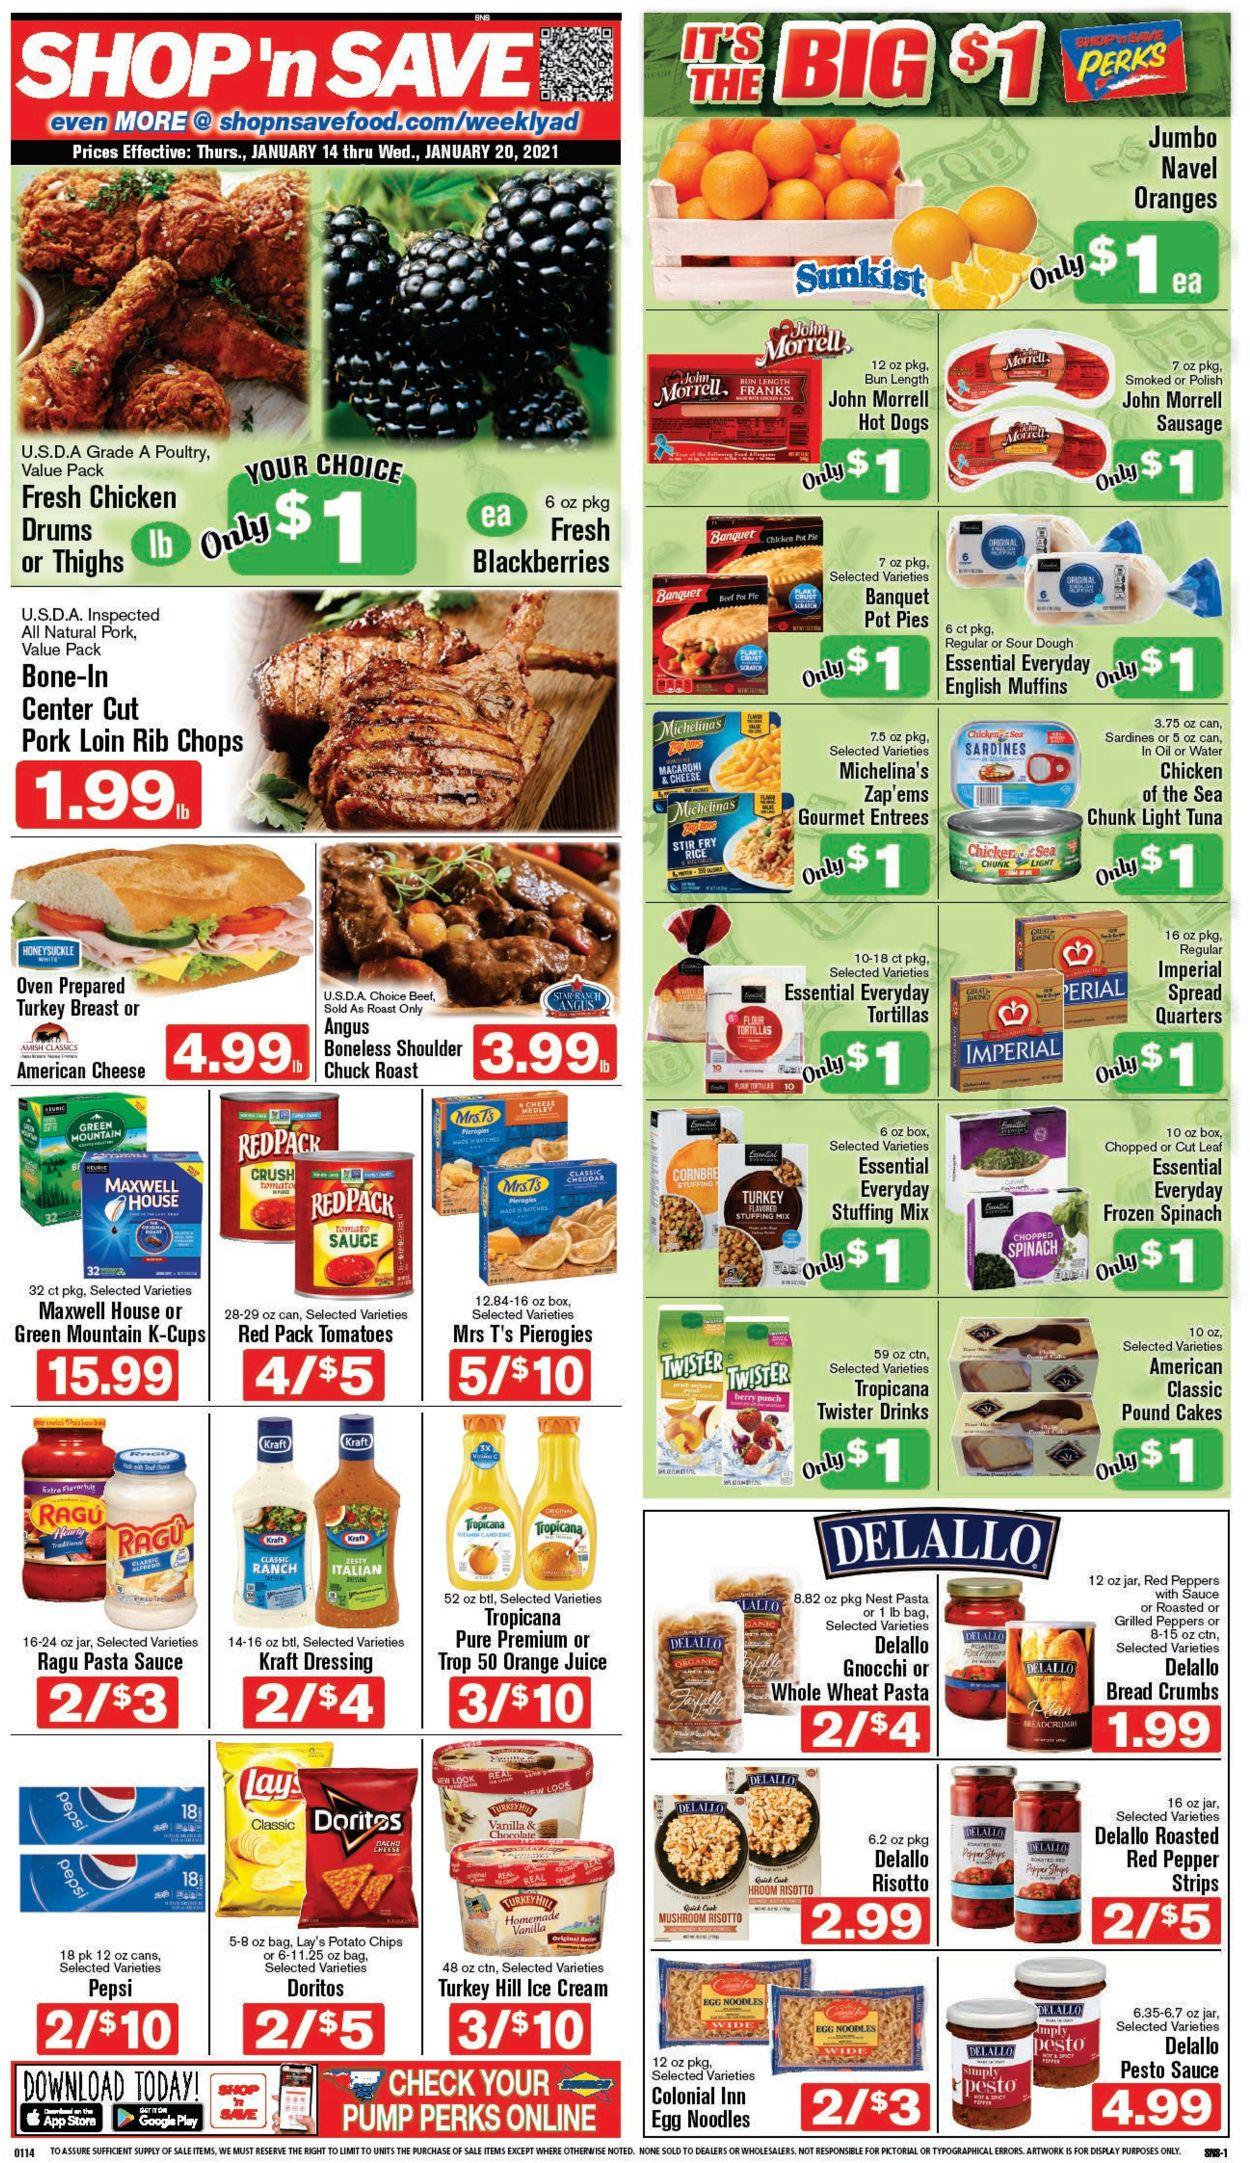 Shop 'n Save Weekly Ad Circular - valid 01/14-01/20/2021